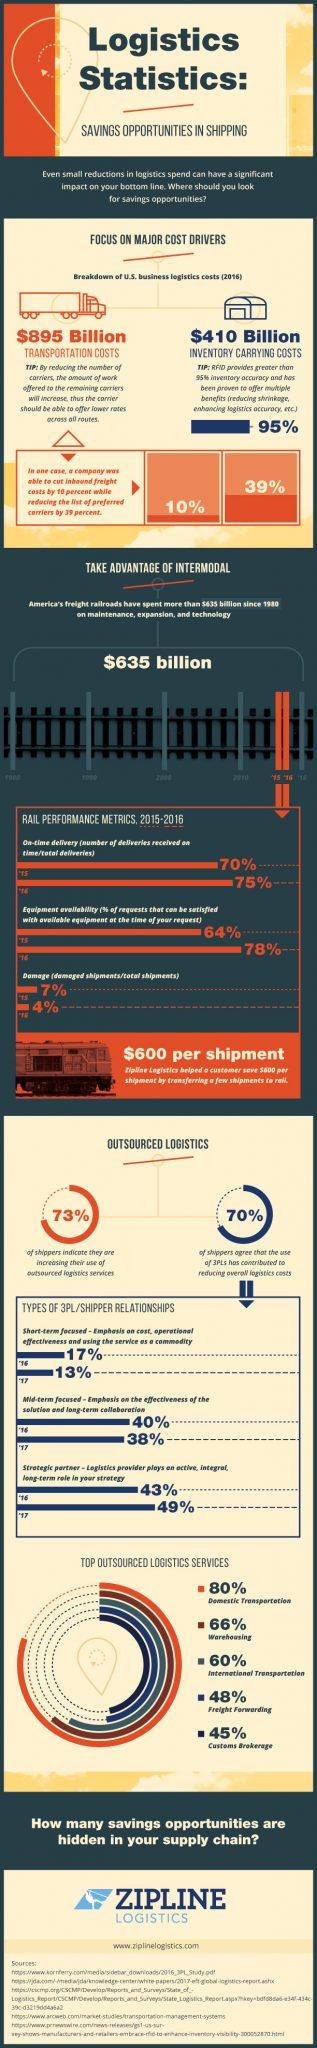 logistics-statistics